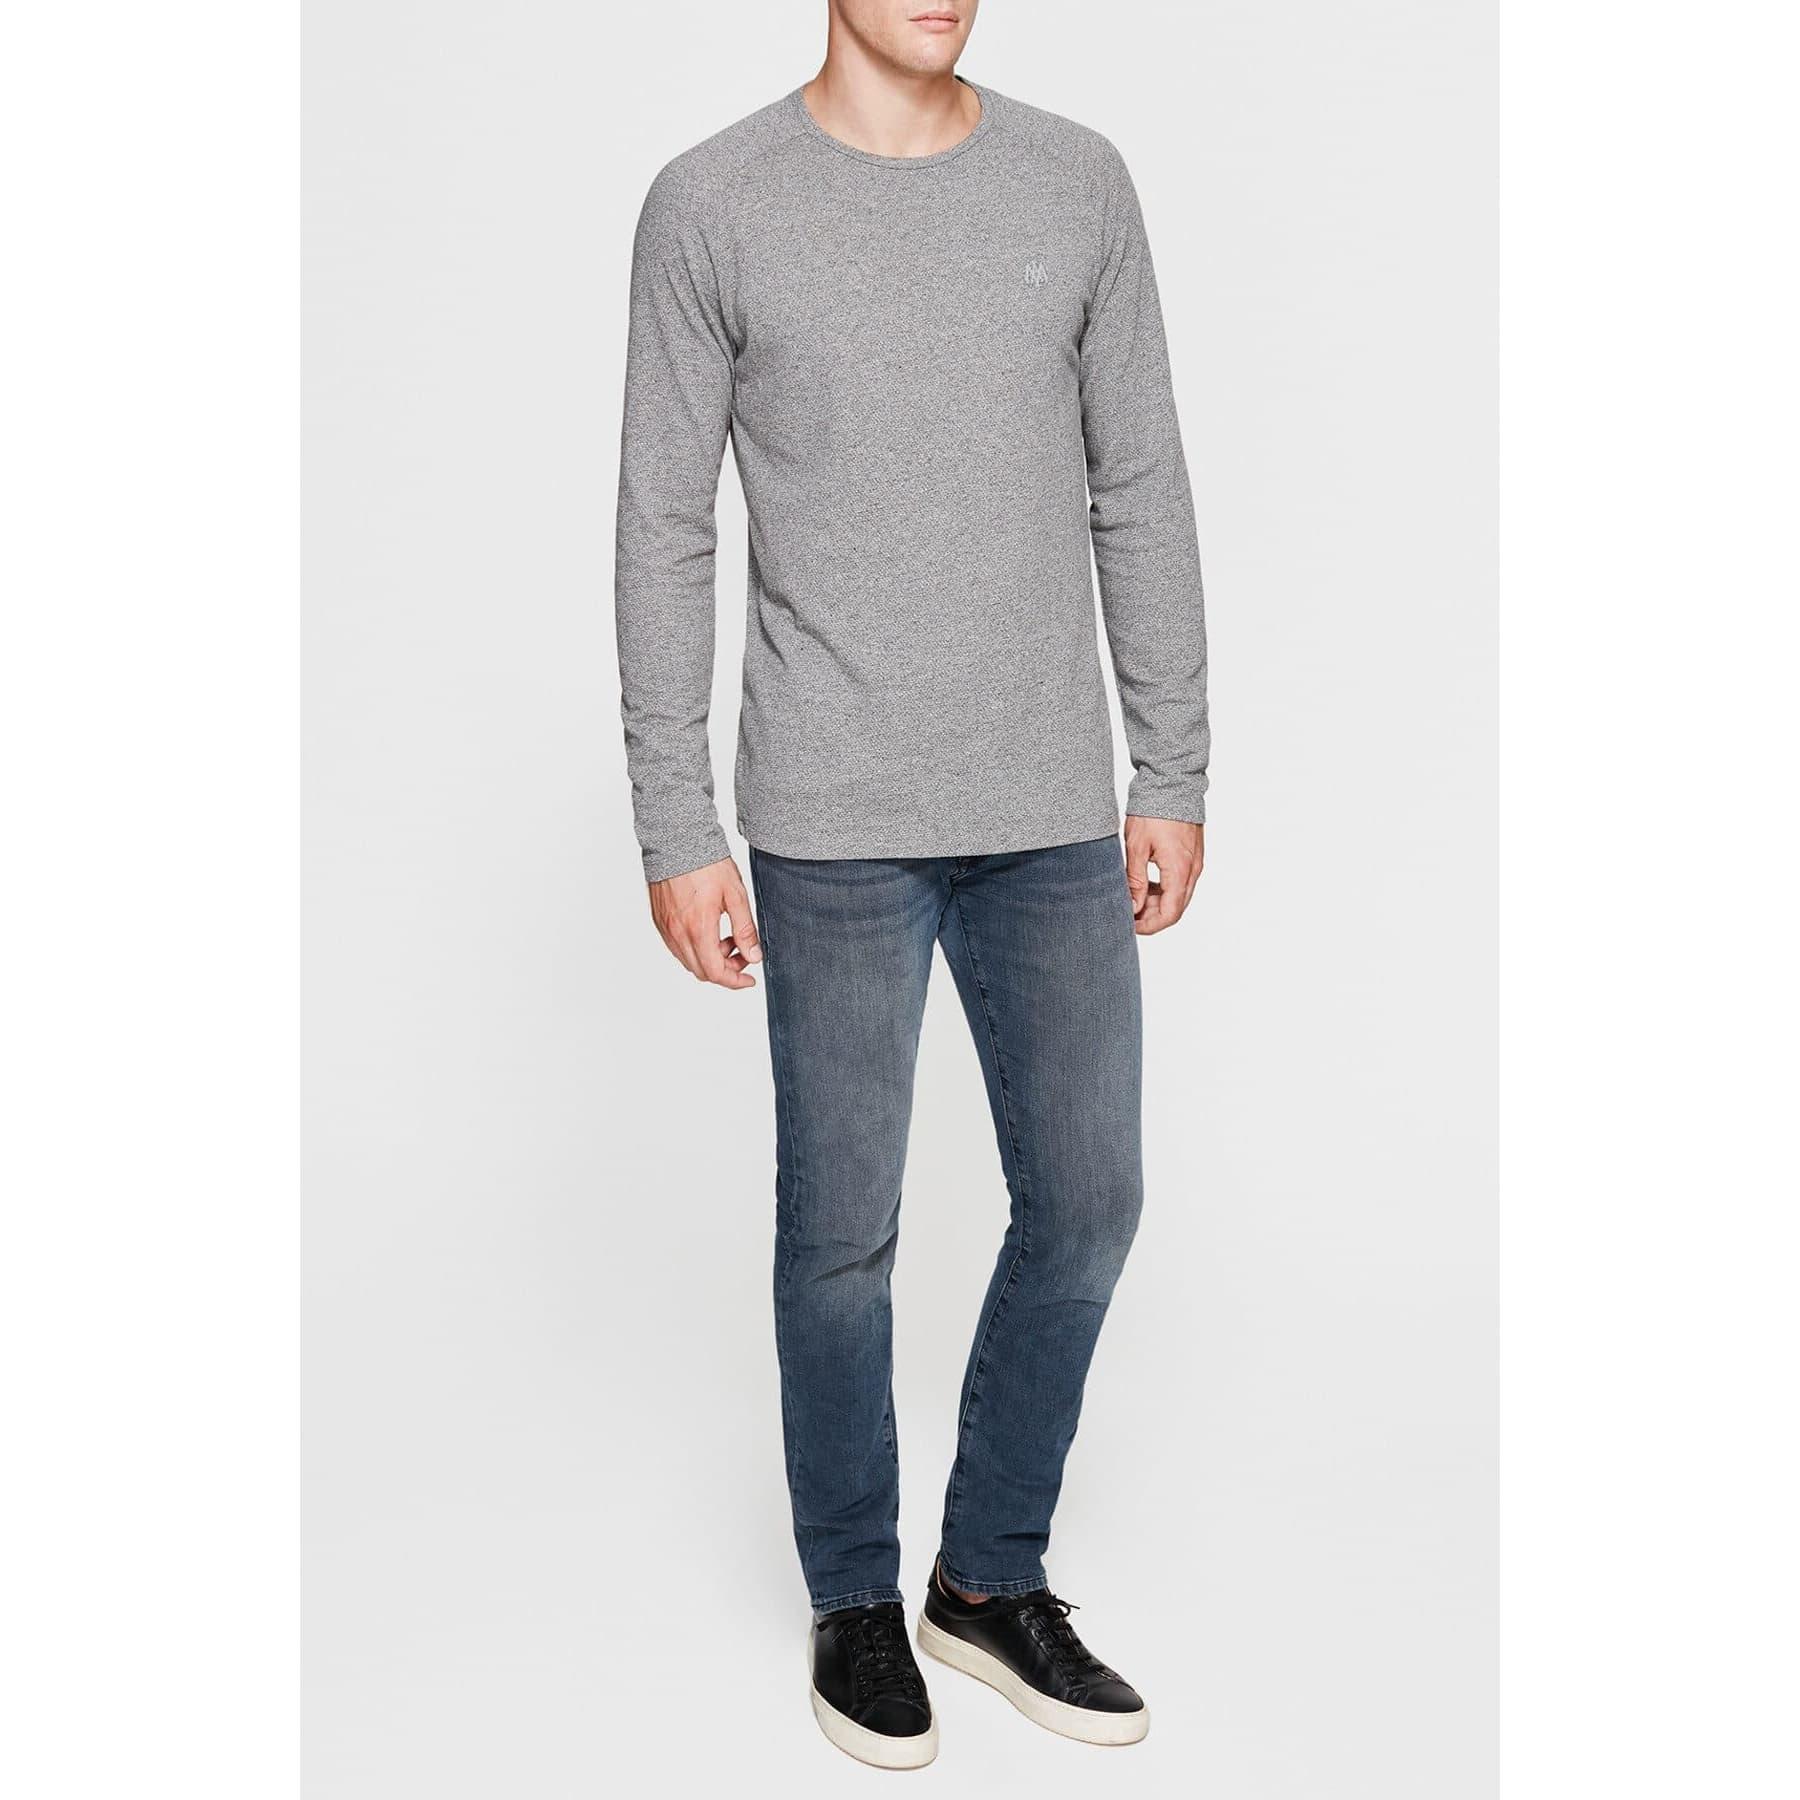 Mavi Jeans Uzun Kollu Gri Erkek Sweatshirt